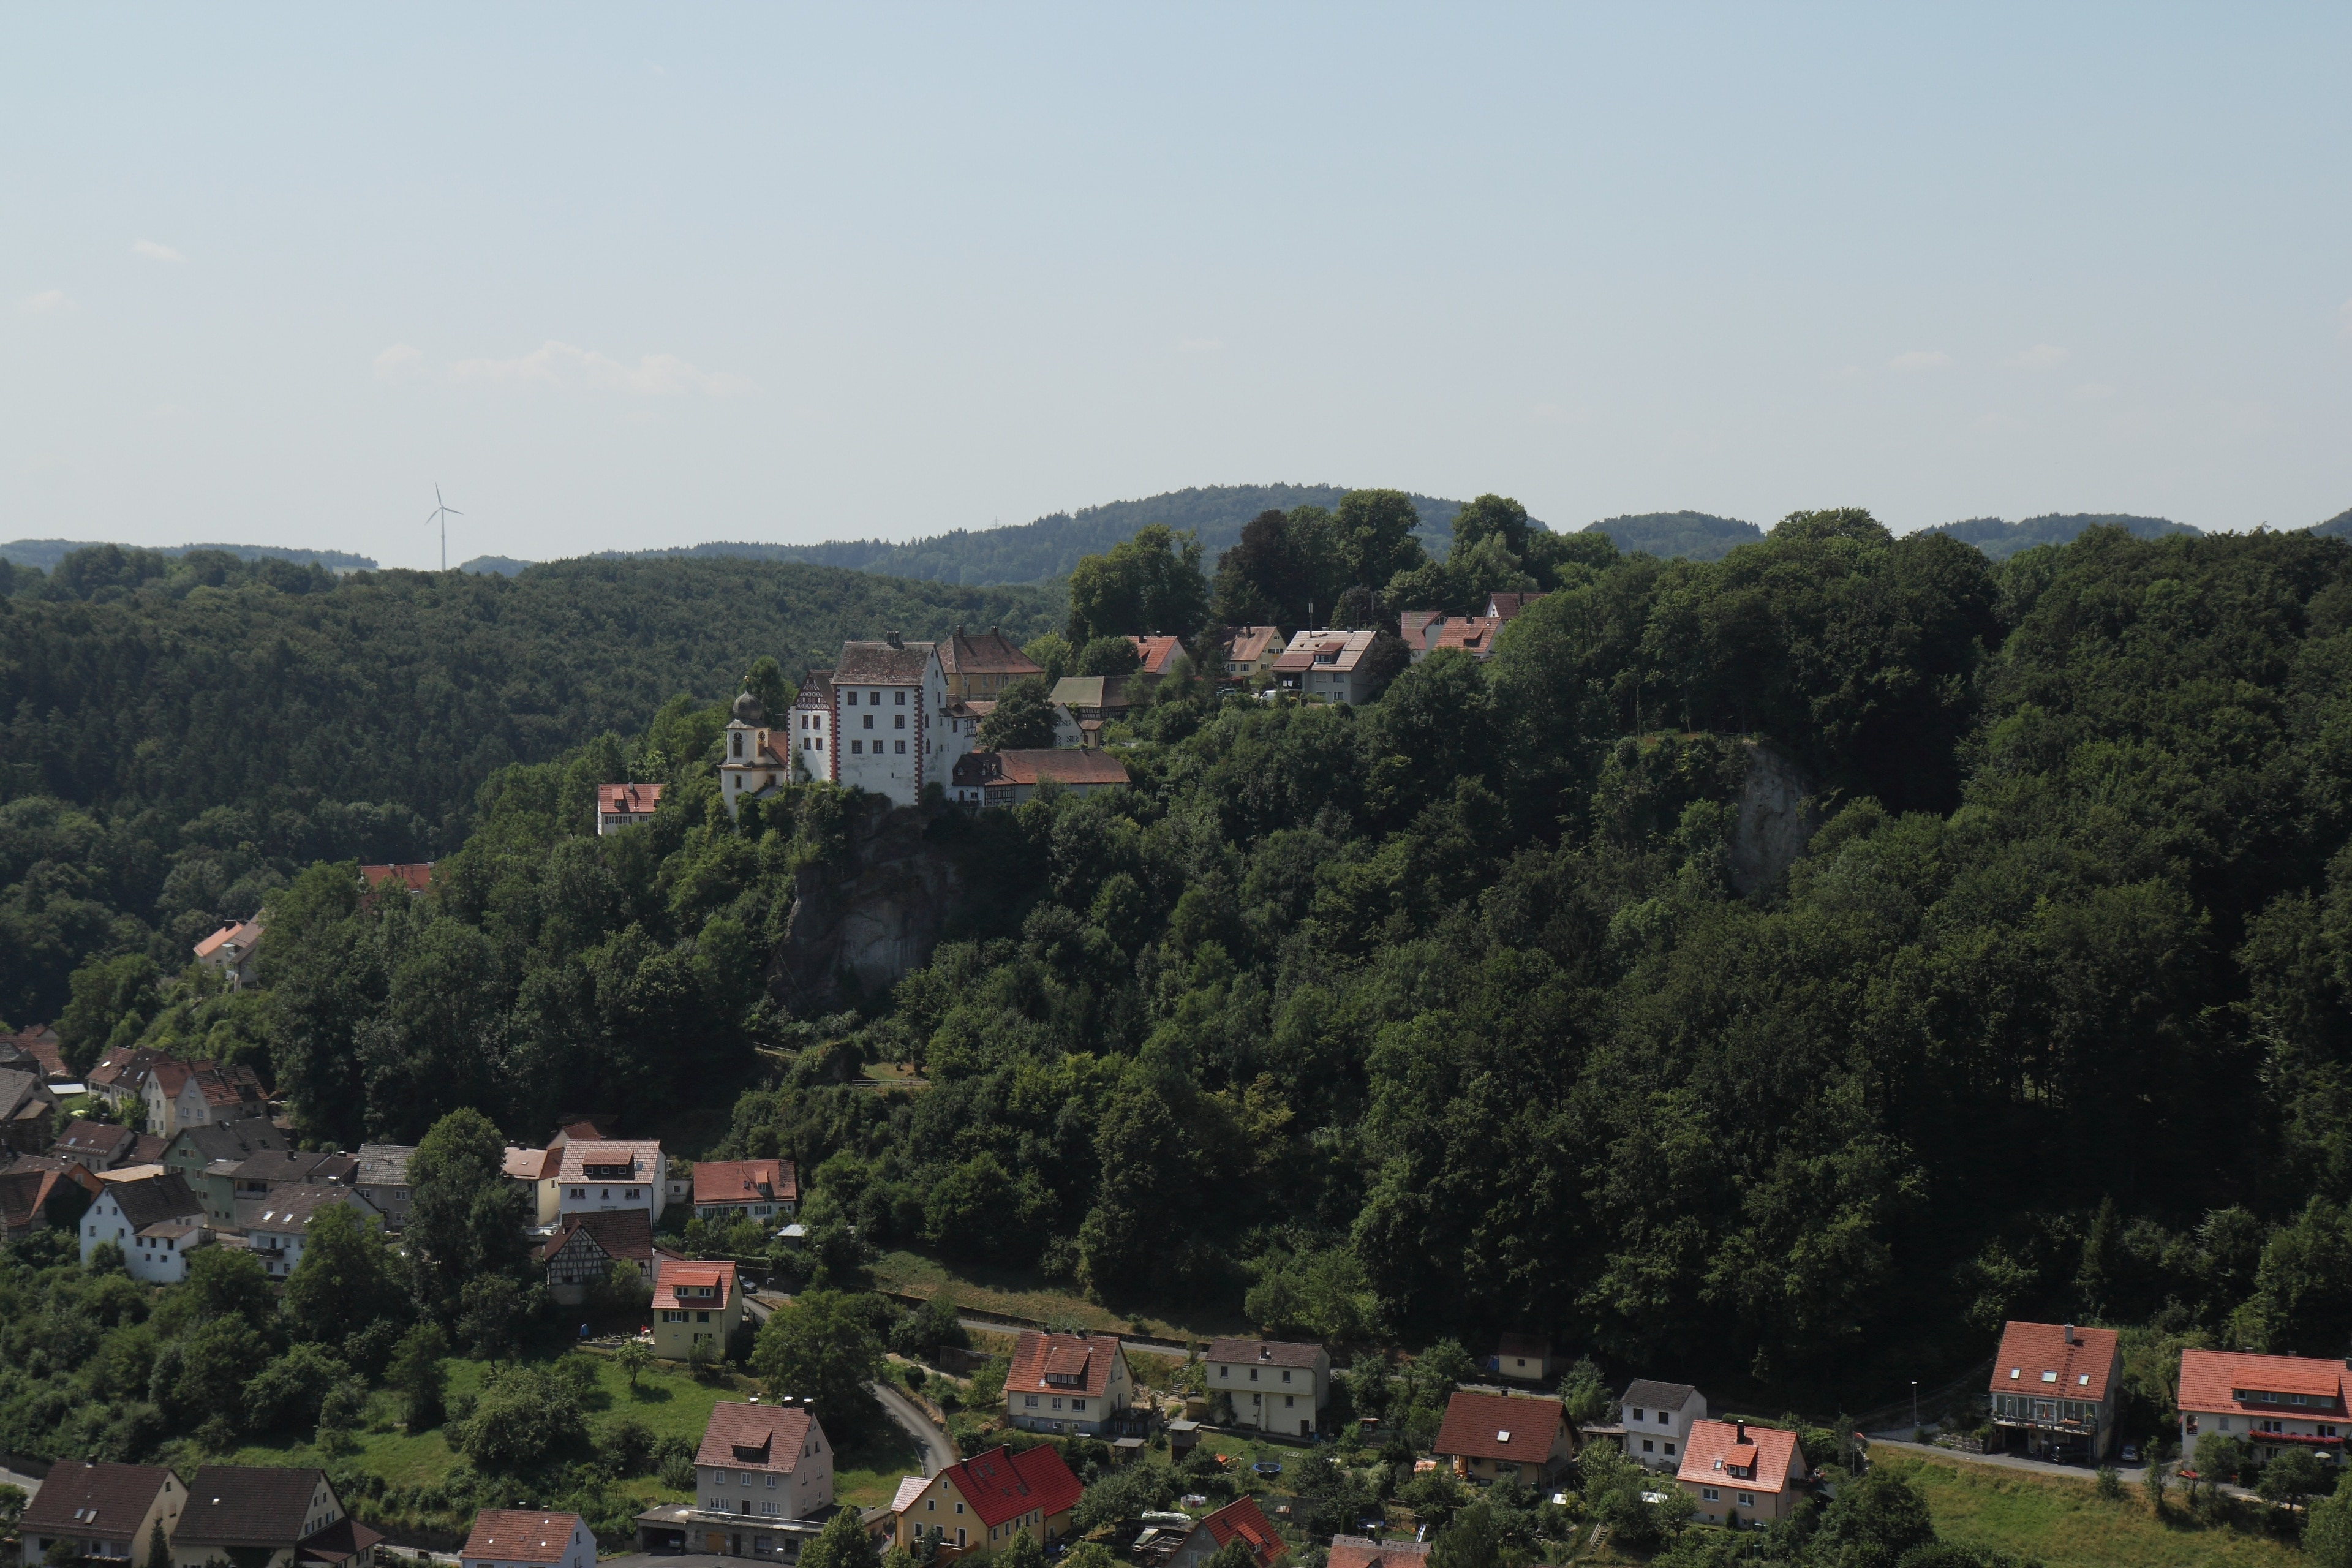 Egloffstein, Bavaria, Germany